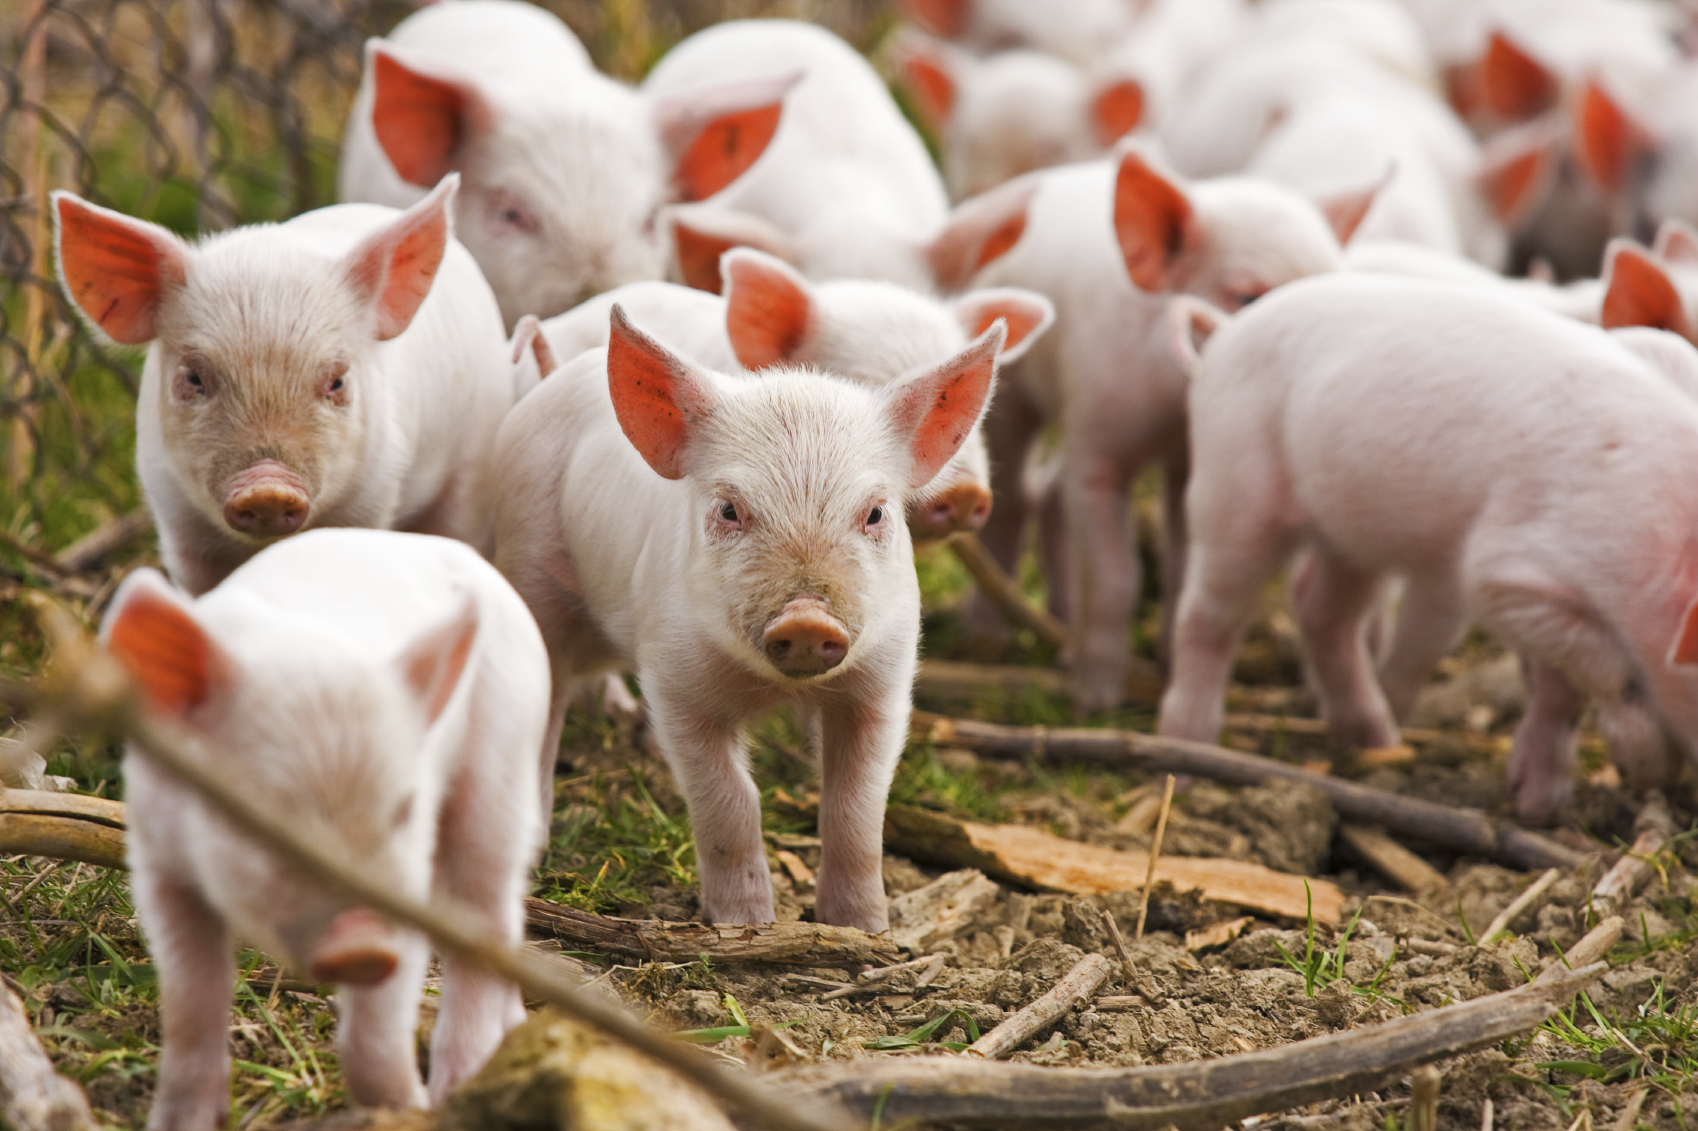 pork farm